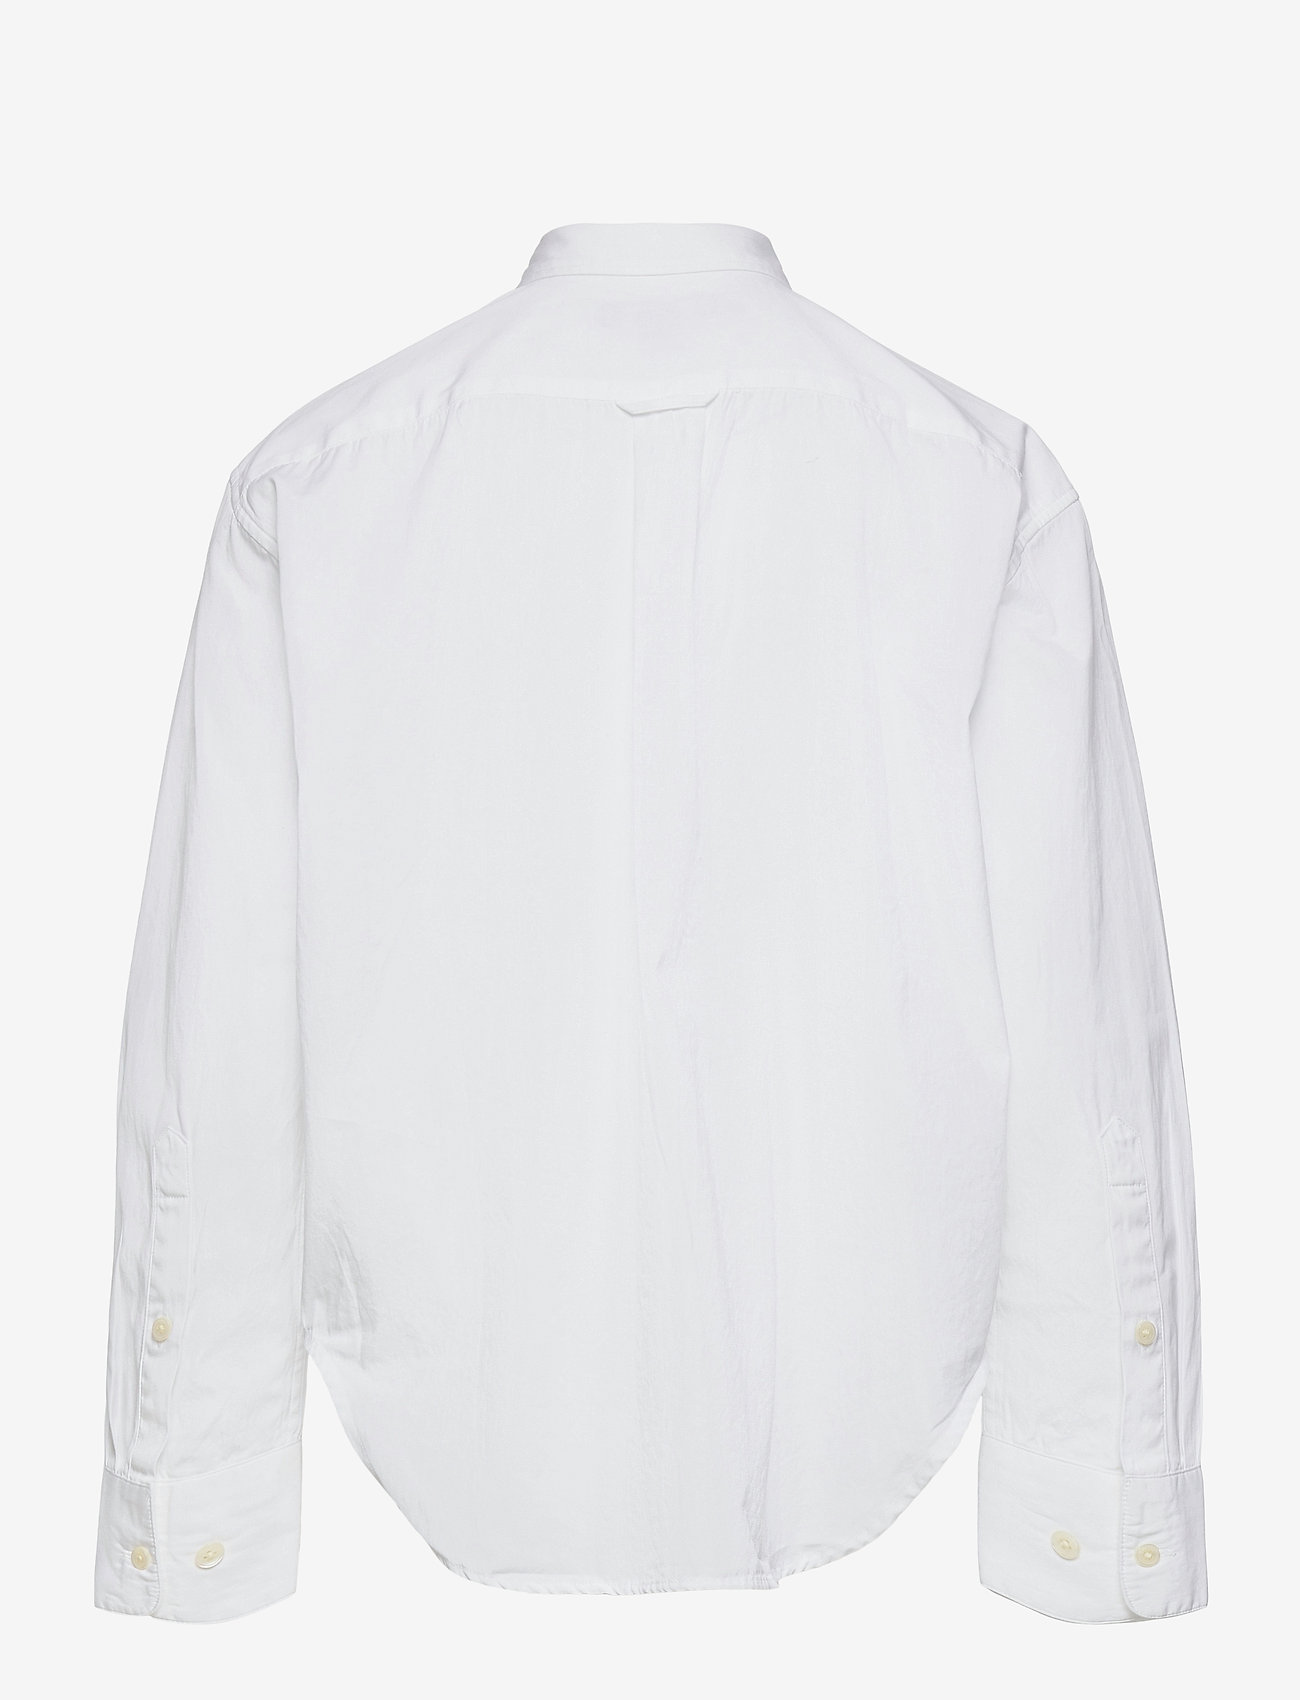 GANT - D1. OVERSIZED POPLIN SHIRT - shirts - white - 1